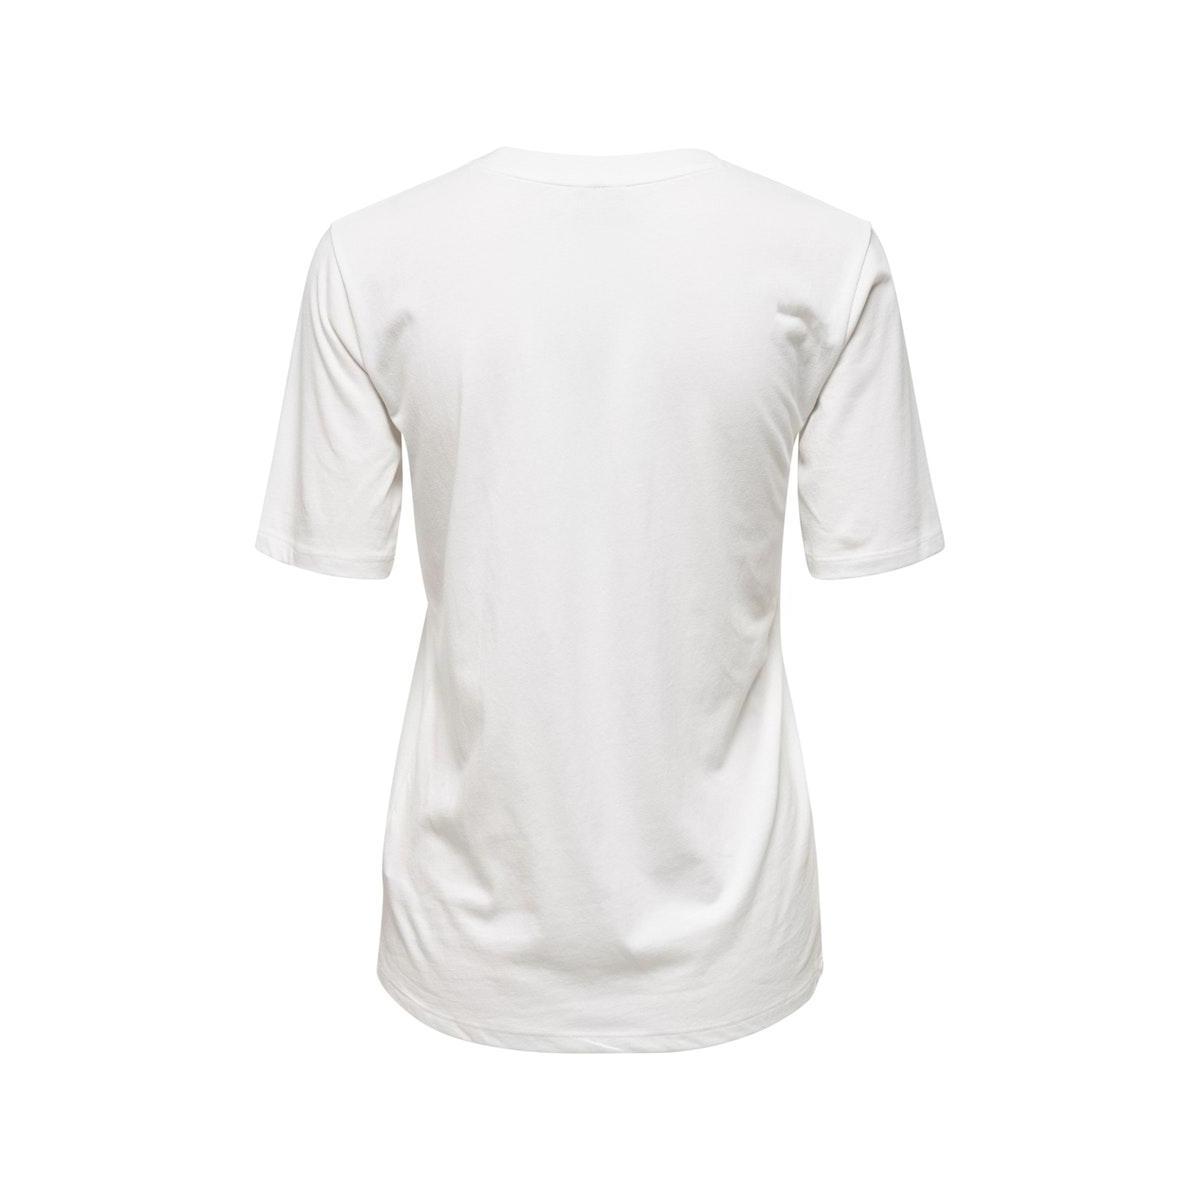 jdynatalie life s/s print top denim 15196545 jacqueline de yong t-shirt cloud dancer/california